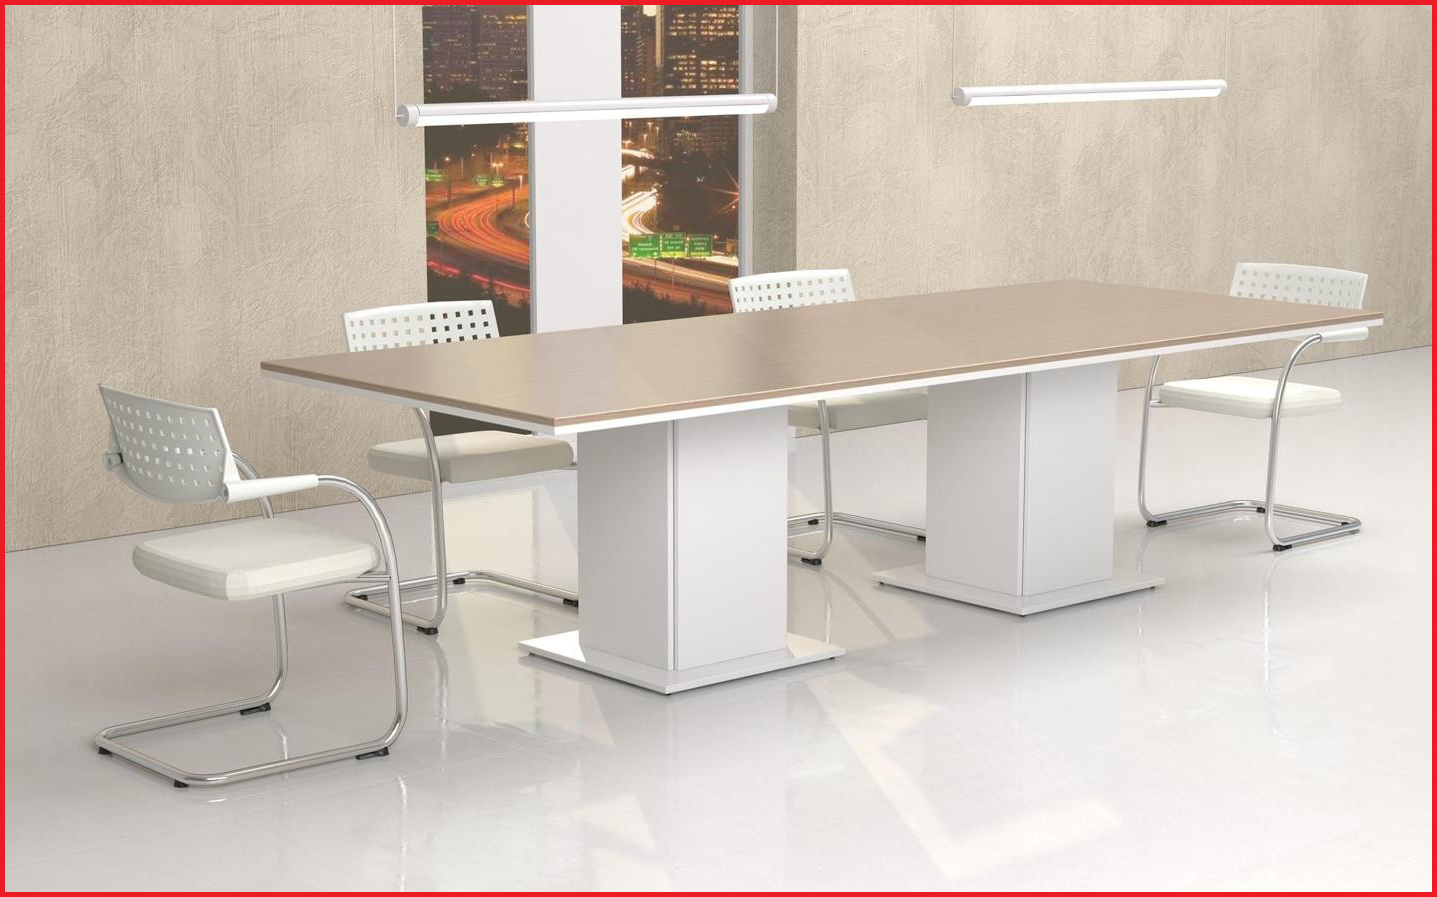 Muebles De Oficina Malaga D0dg Muebles De Oficina Malaga Mobiliario De Oficina En MÃ Laga